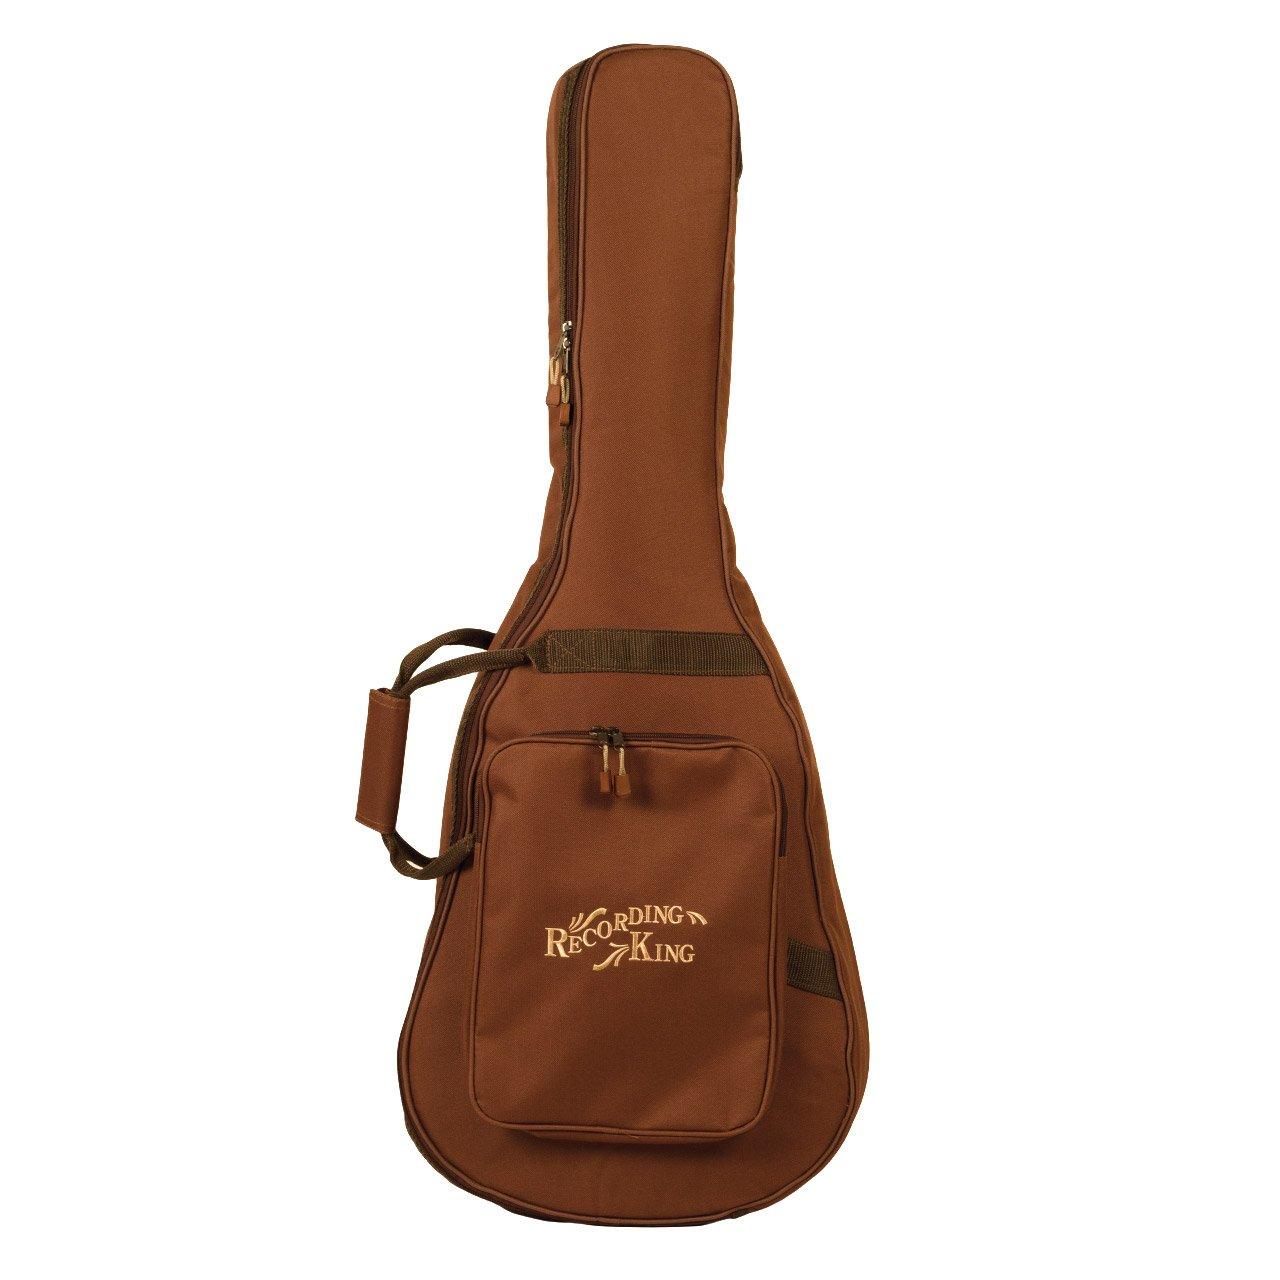 Recording King CG-250K-O 250 Series Bag, 0-Style Acoustic